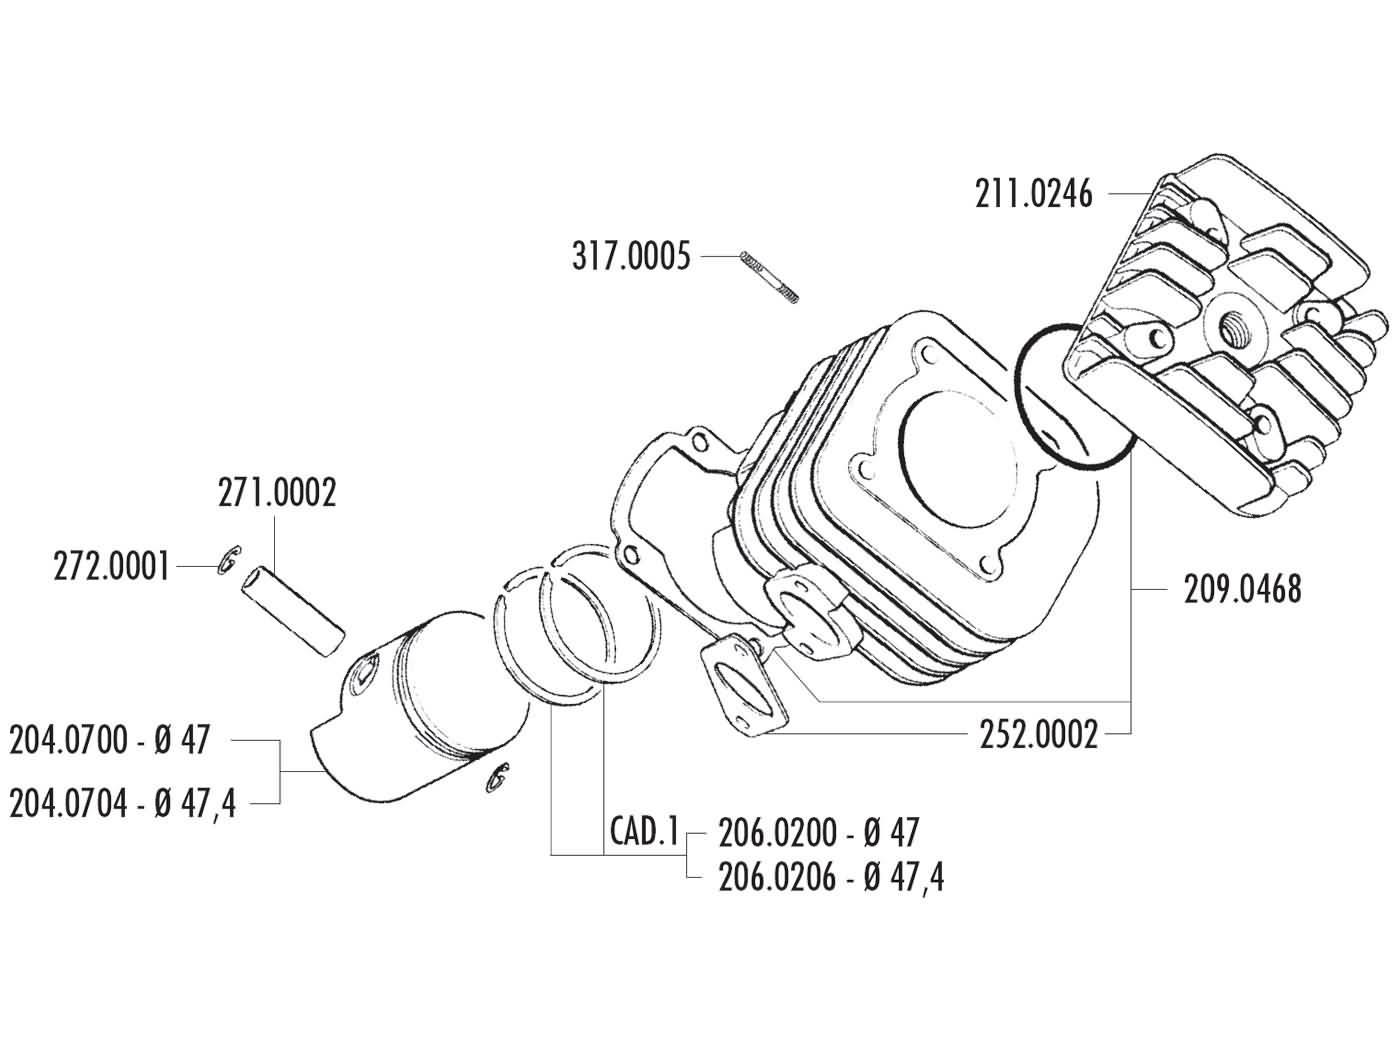 cylinder kit Polini cast iron sport 70cc 47mm for Kymco AC